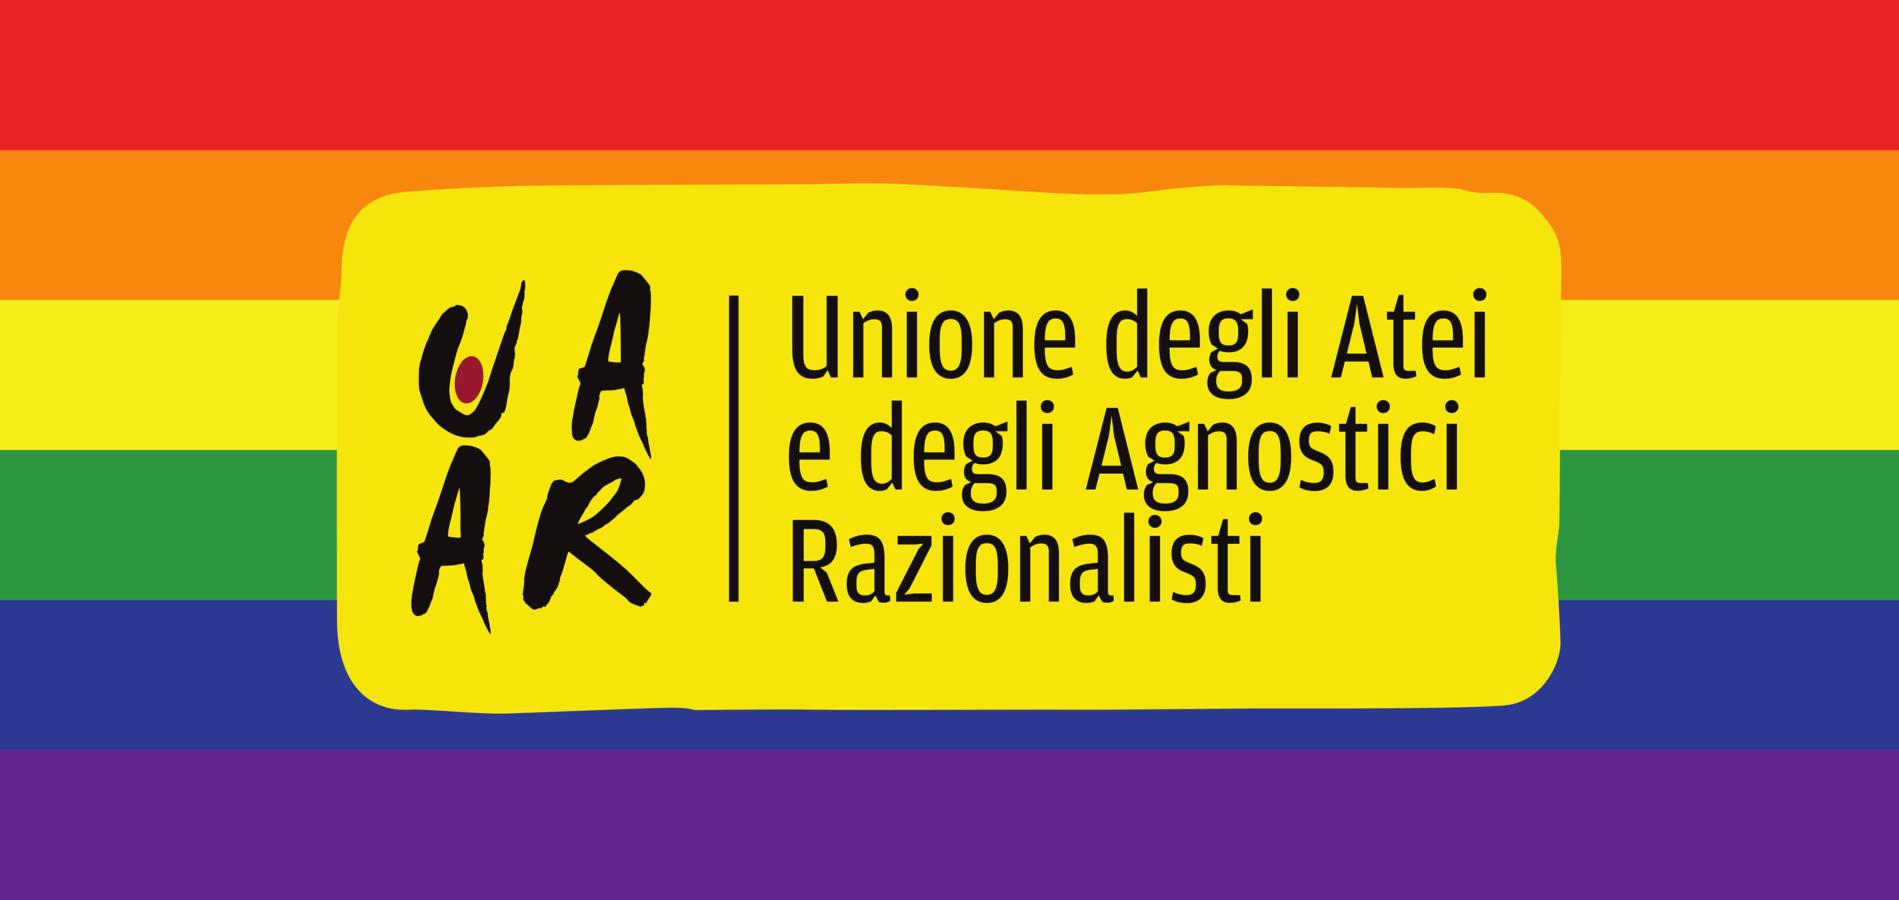 uaar-pride-16-og